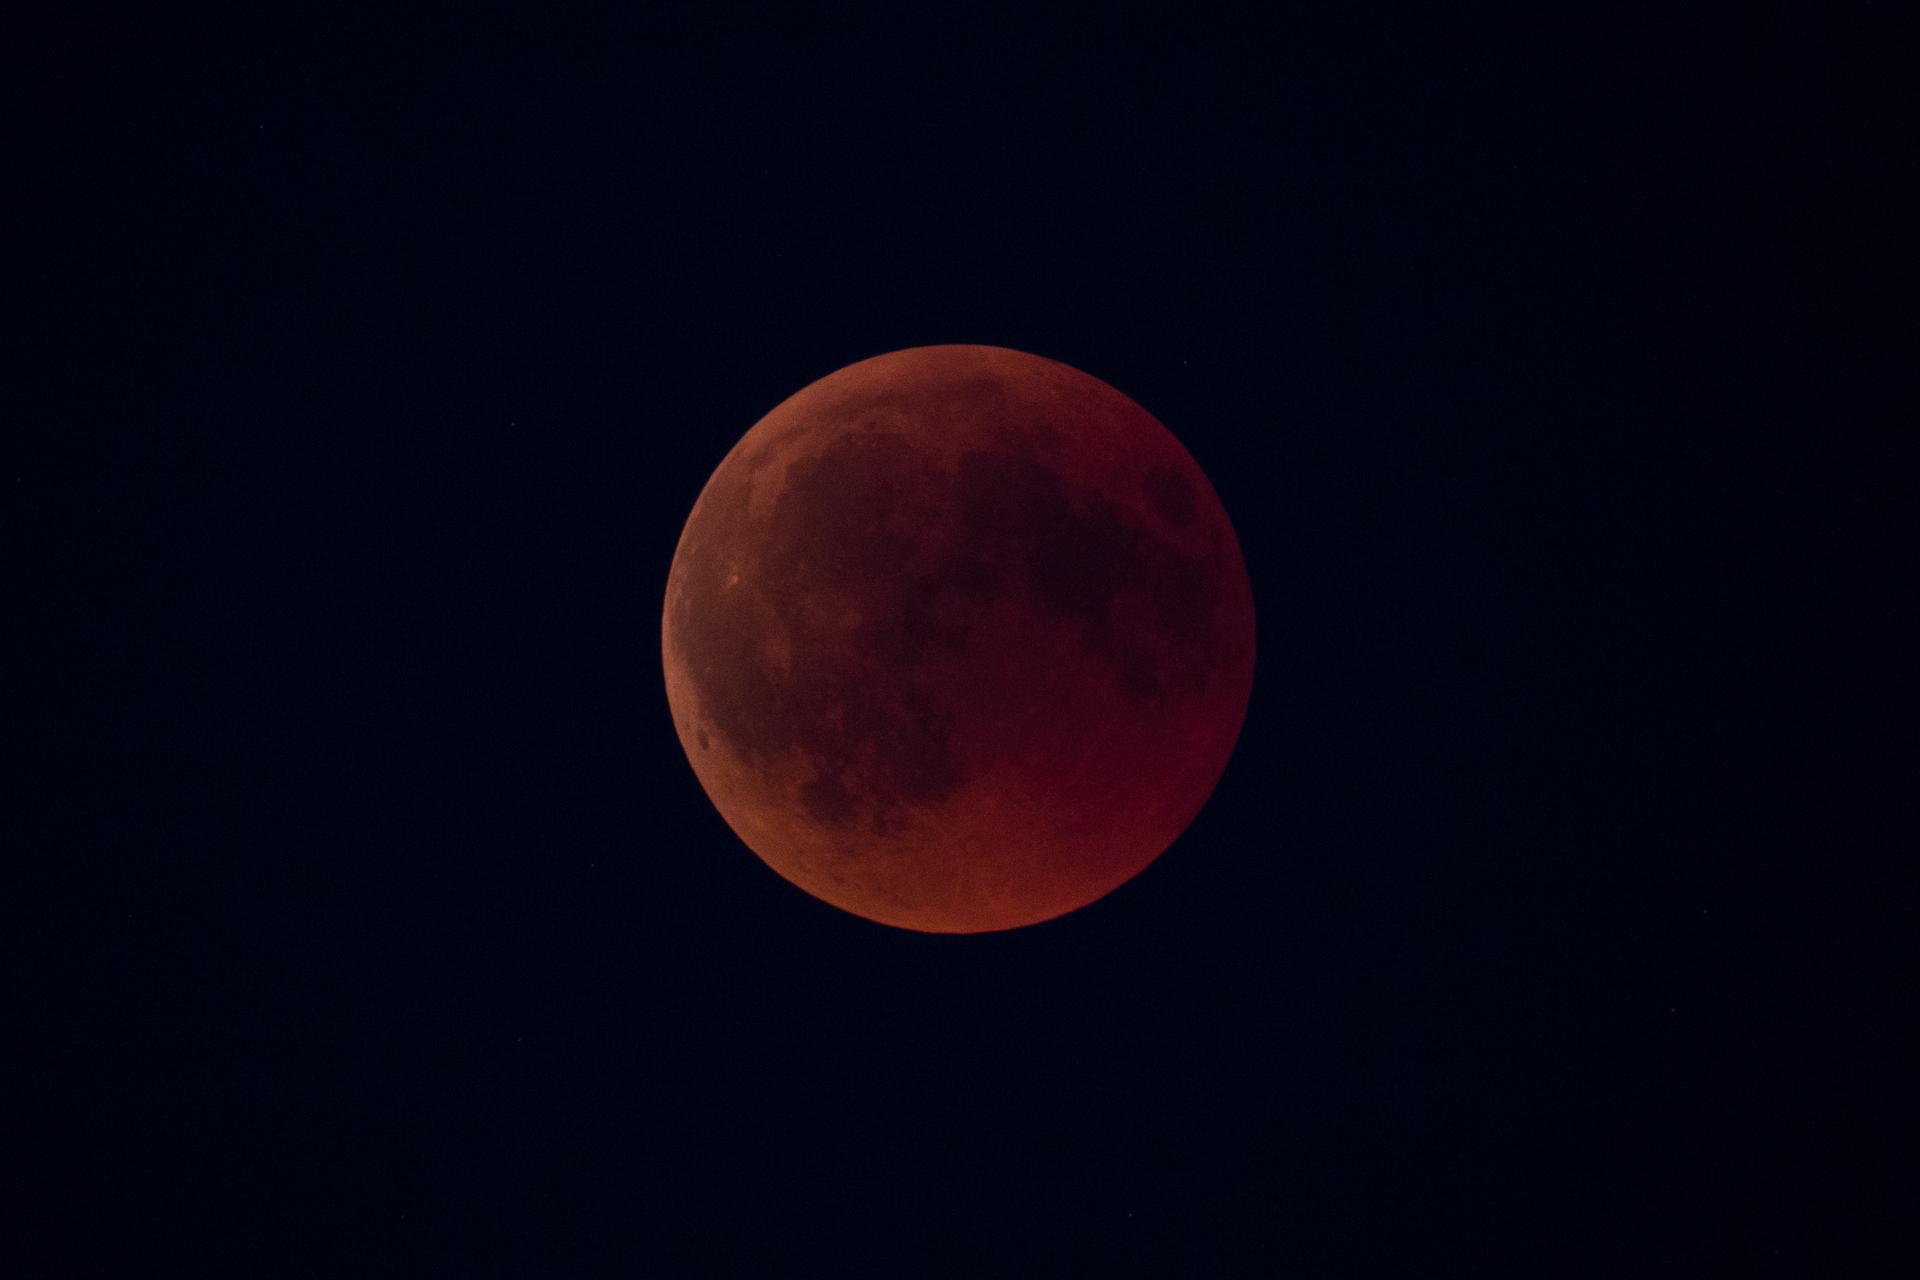 20180727_LunarEclipse-2